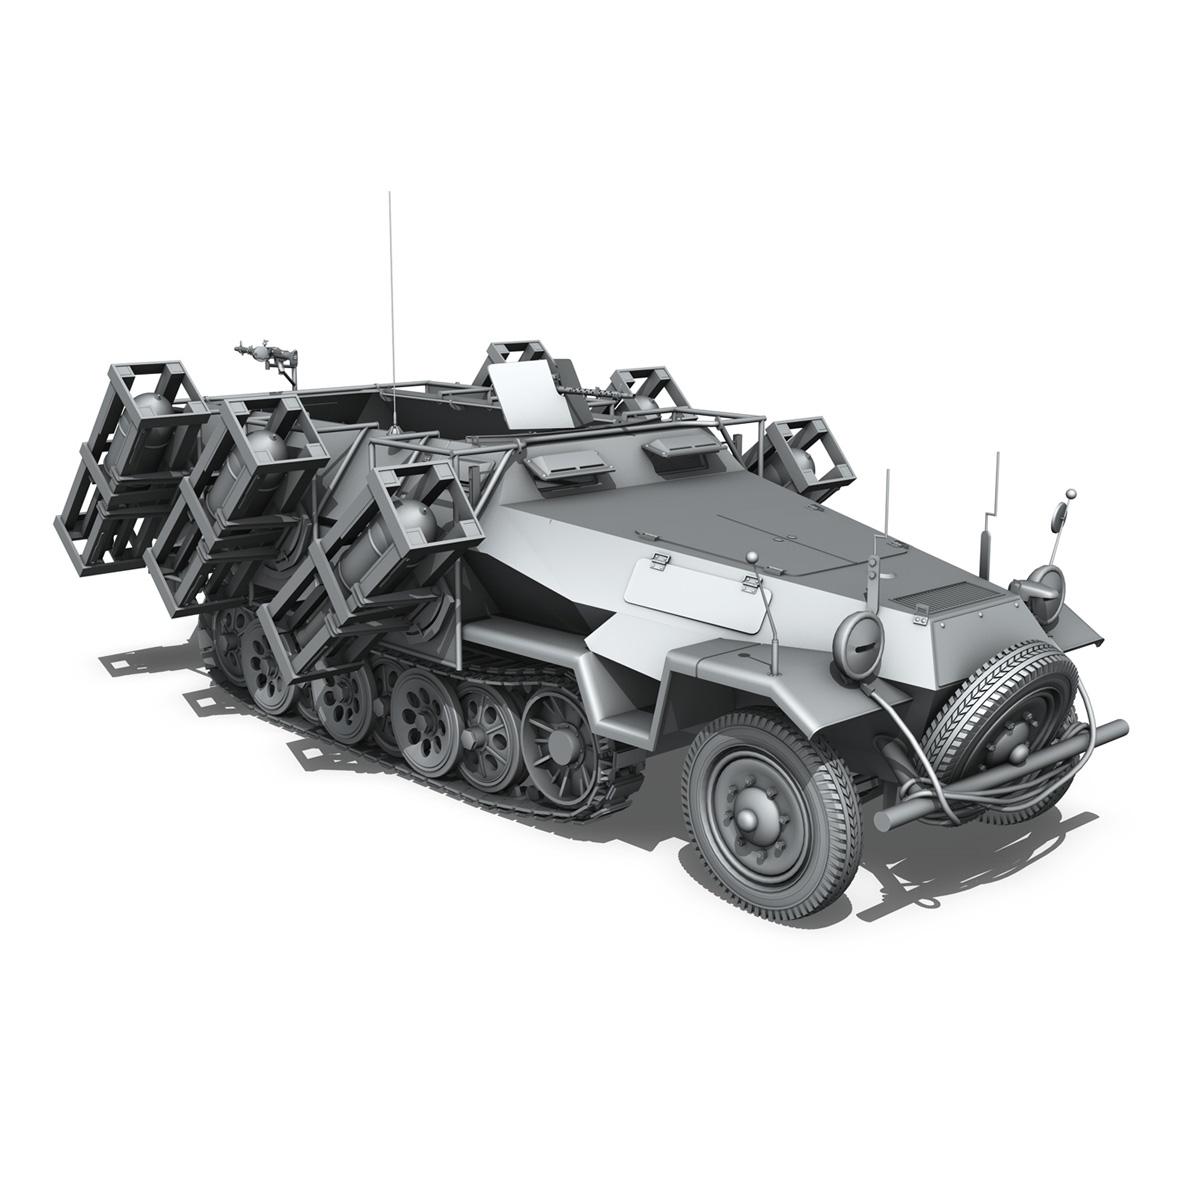 sdkfz 251 ausf.b – ground stuka 3d model 3ds fbx c4d lwo obj 251685